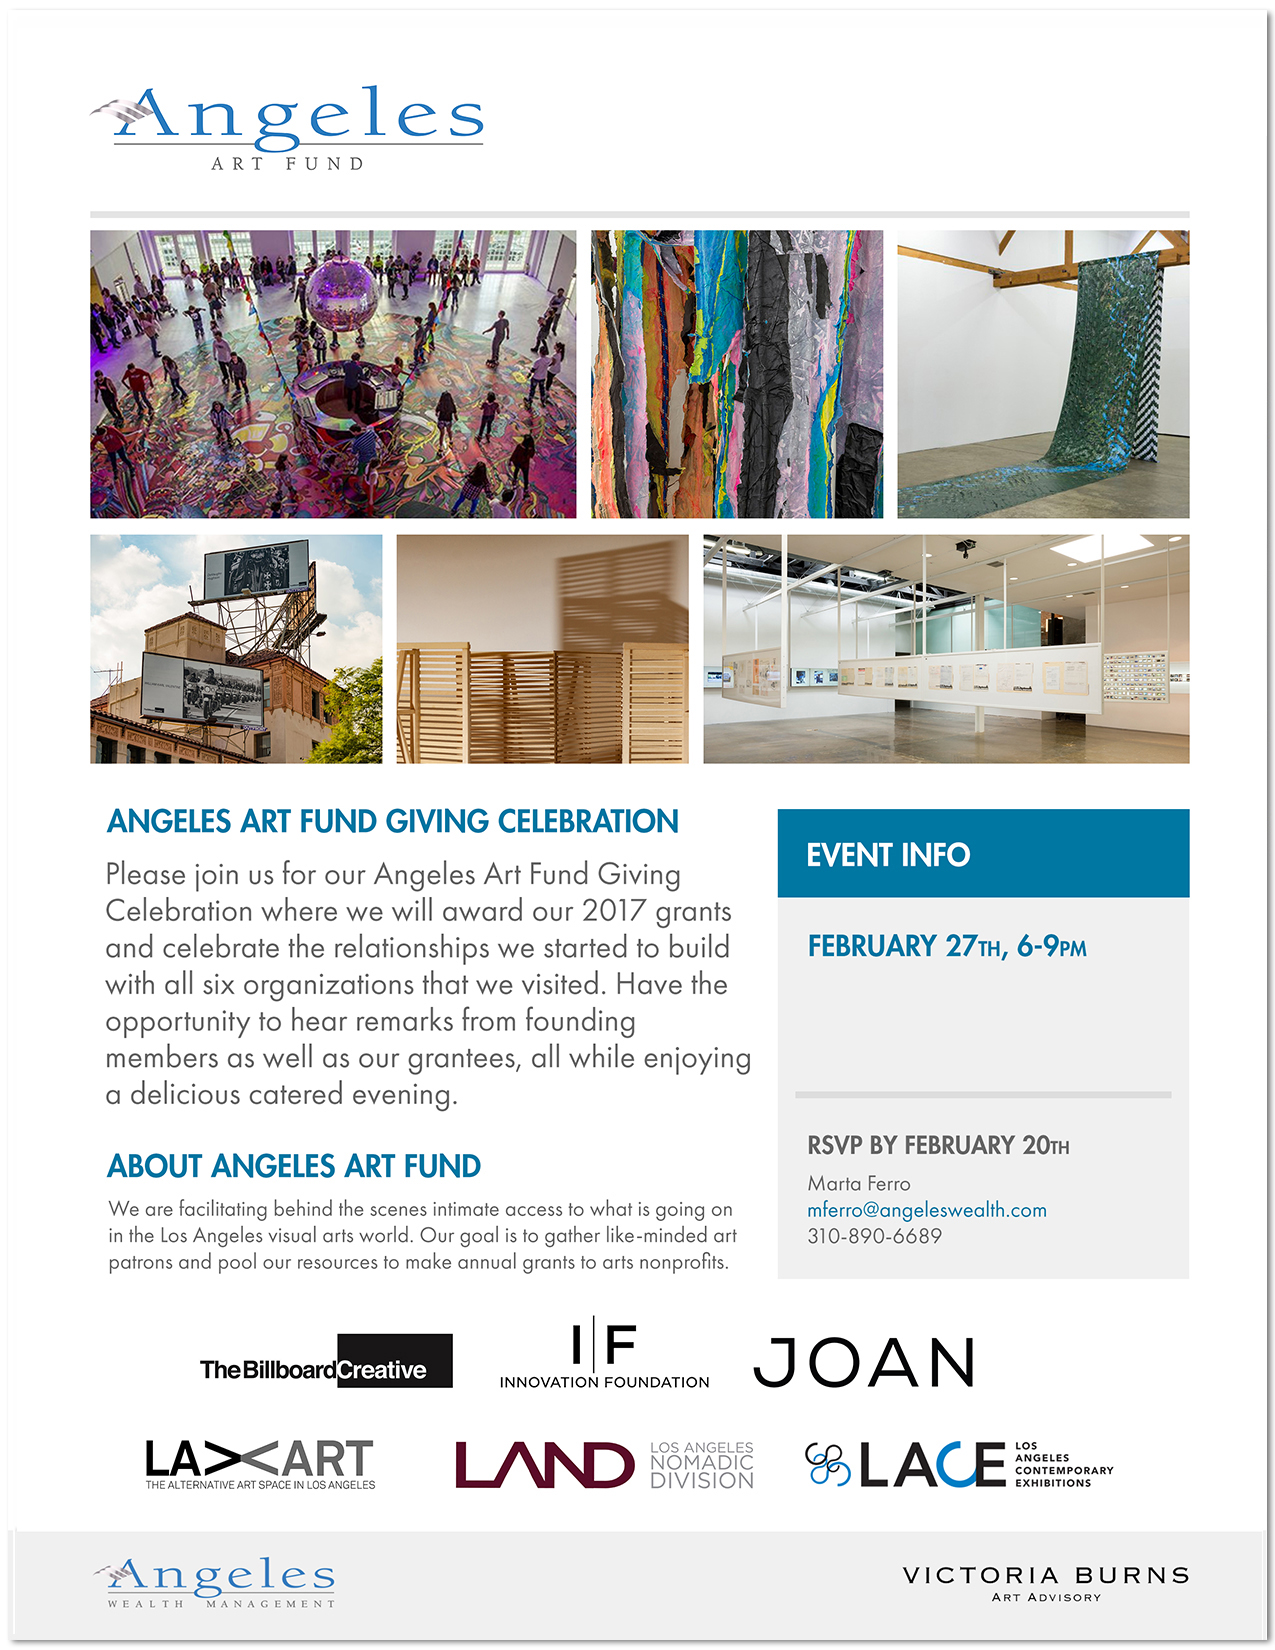 Angeles Art Fund-invite-02-27-2018 copy.jpg